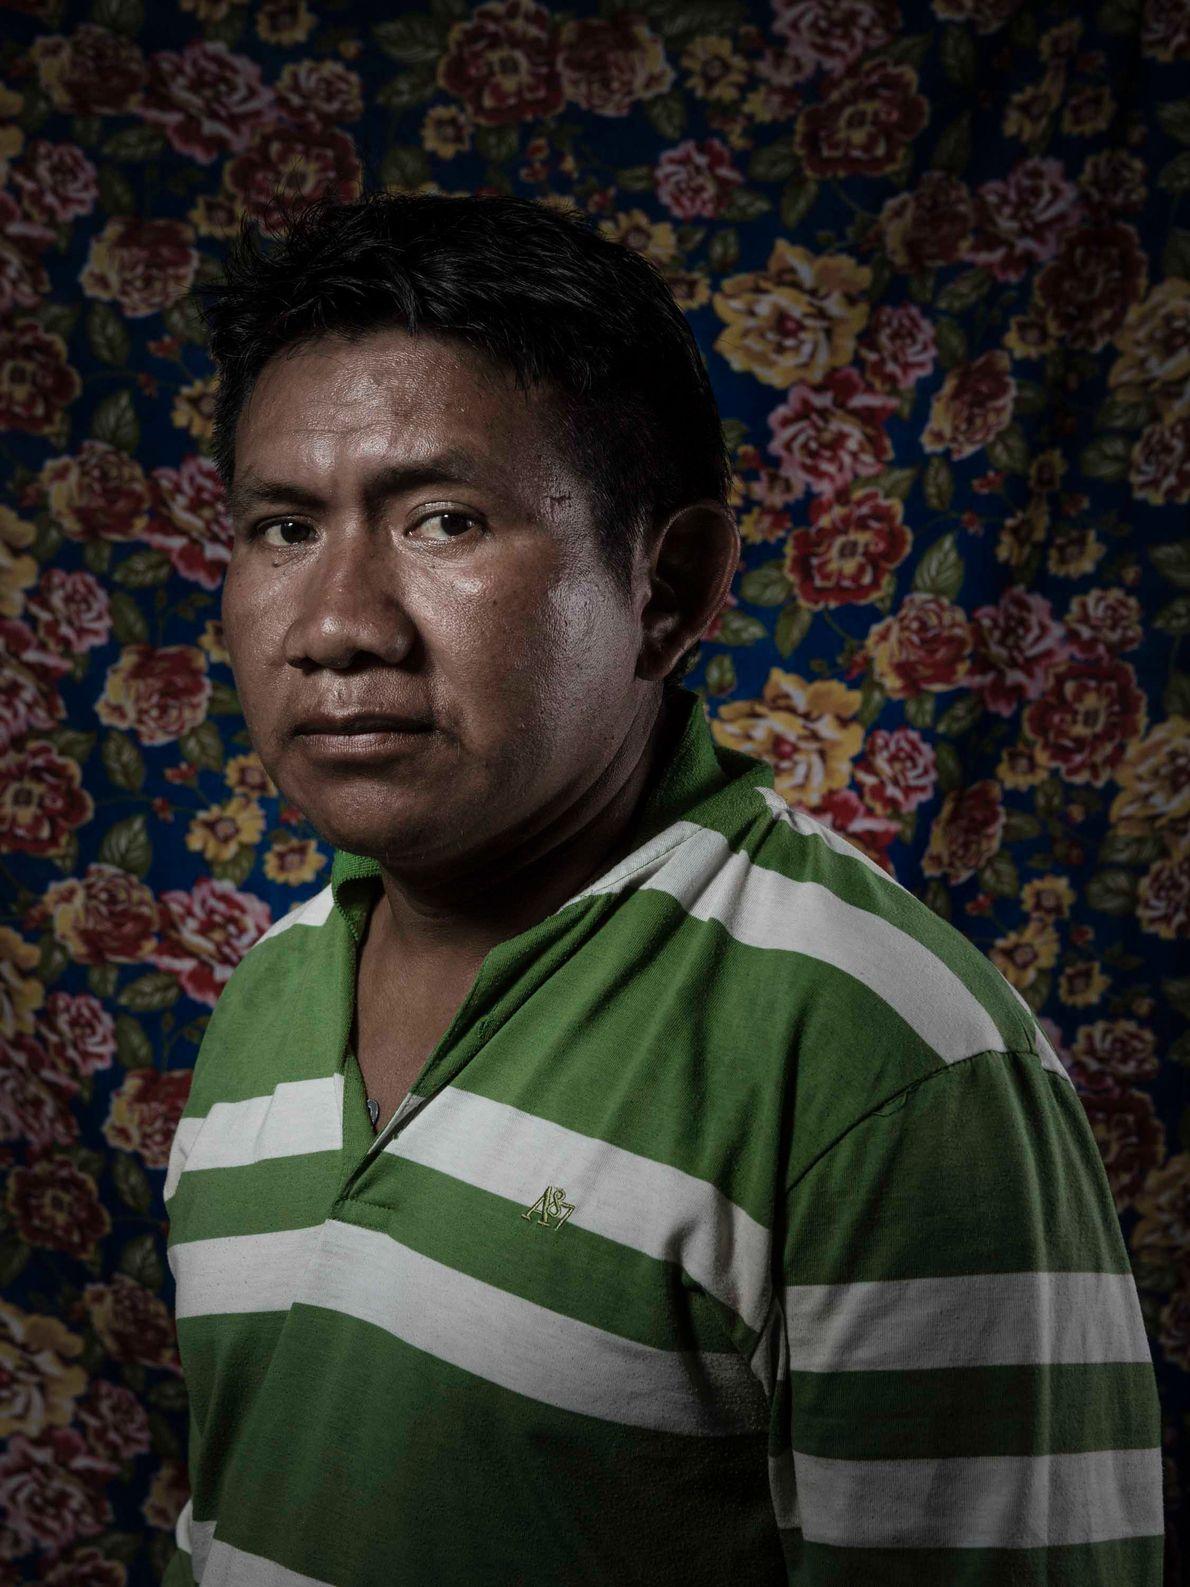 retratos-imigrantes-venezuelanos-brasil